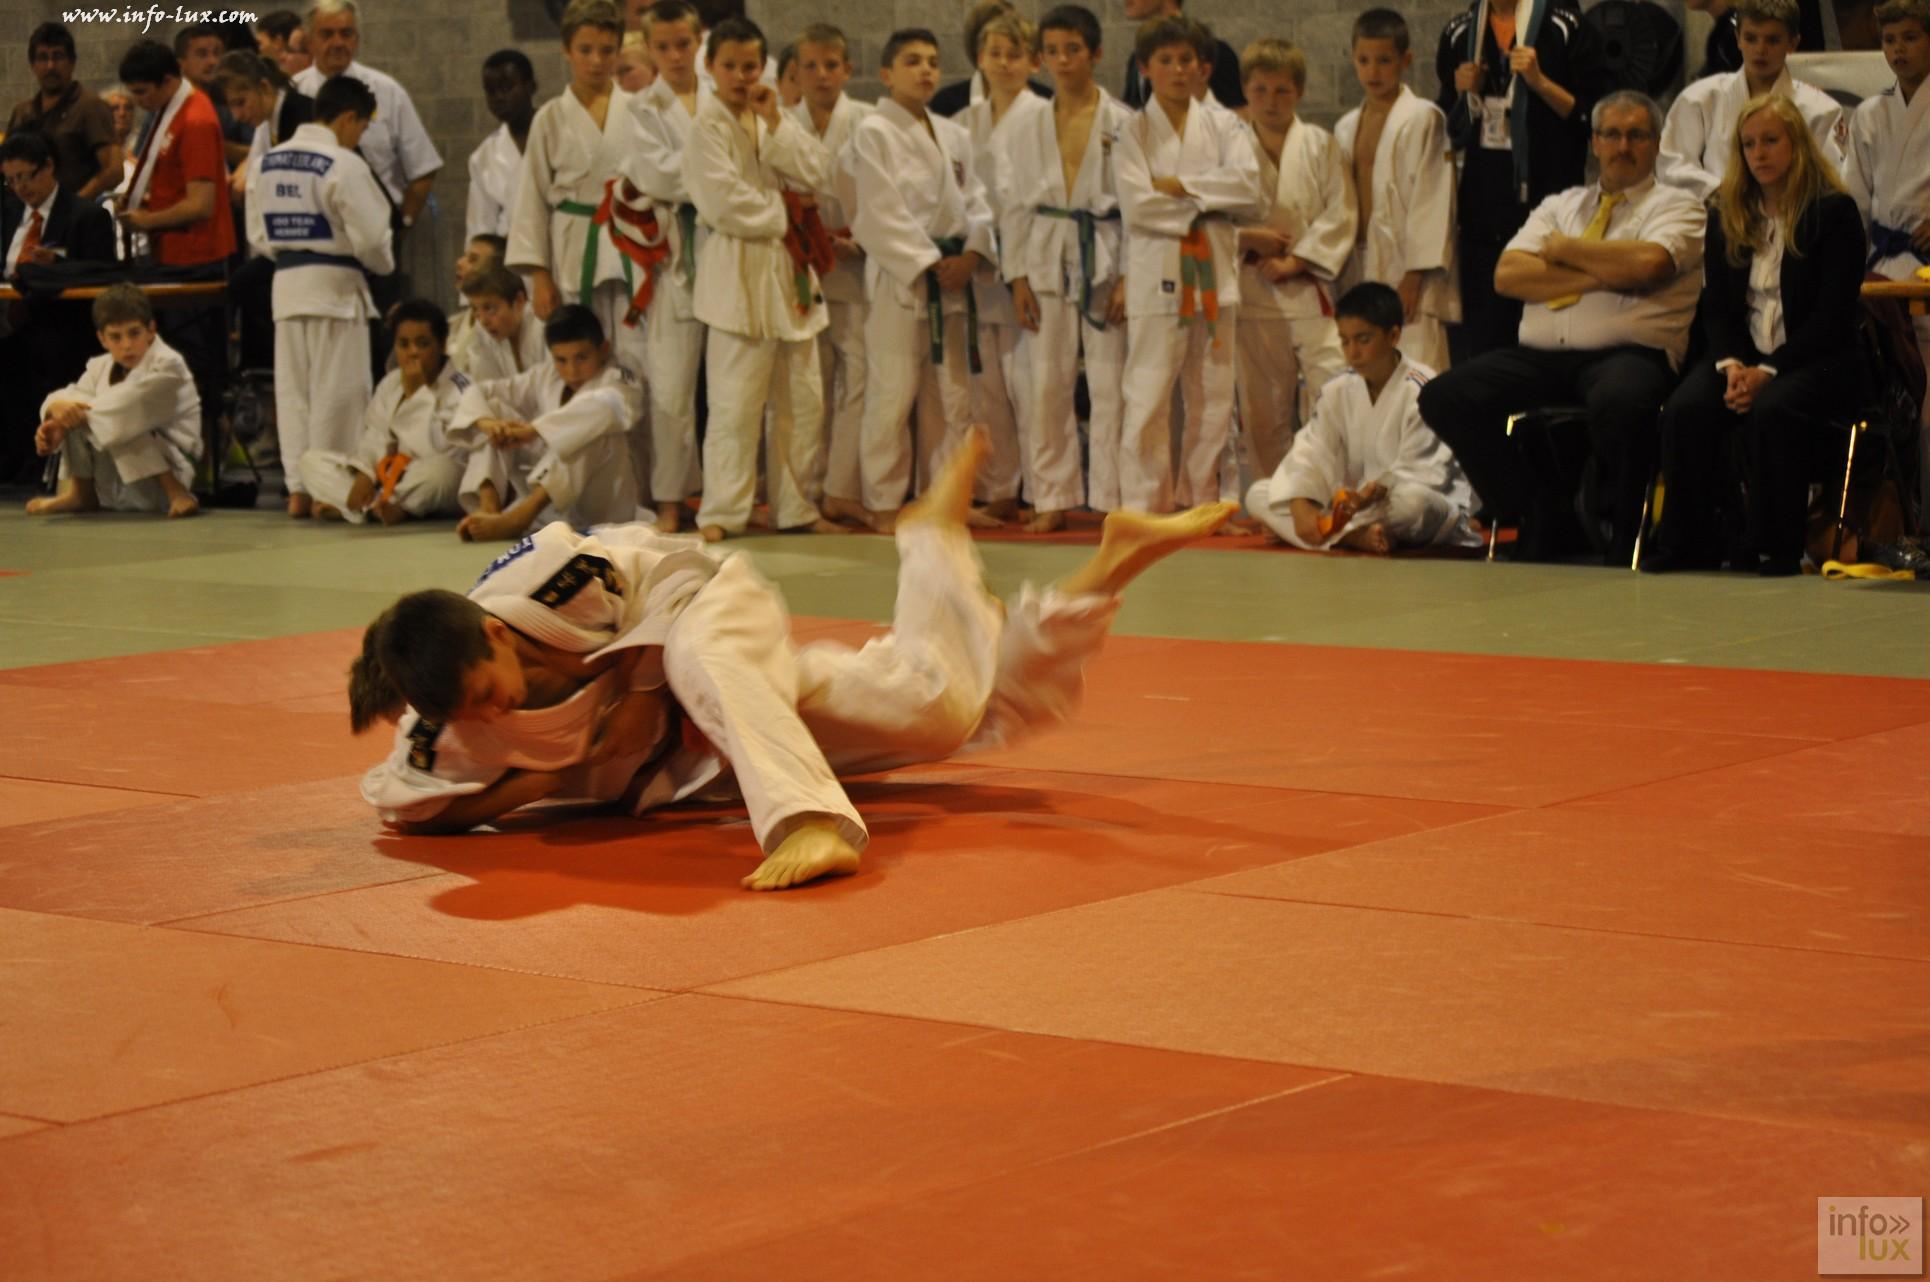 images/stories/PHOTOSREP/Bastogne/judo/Judo-Basto50